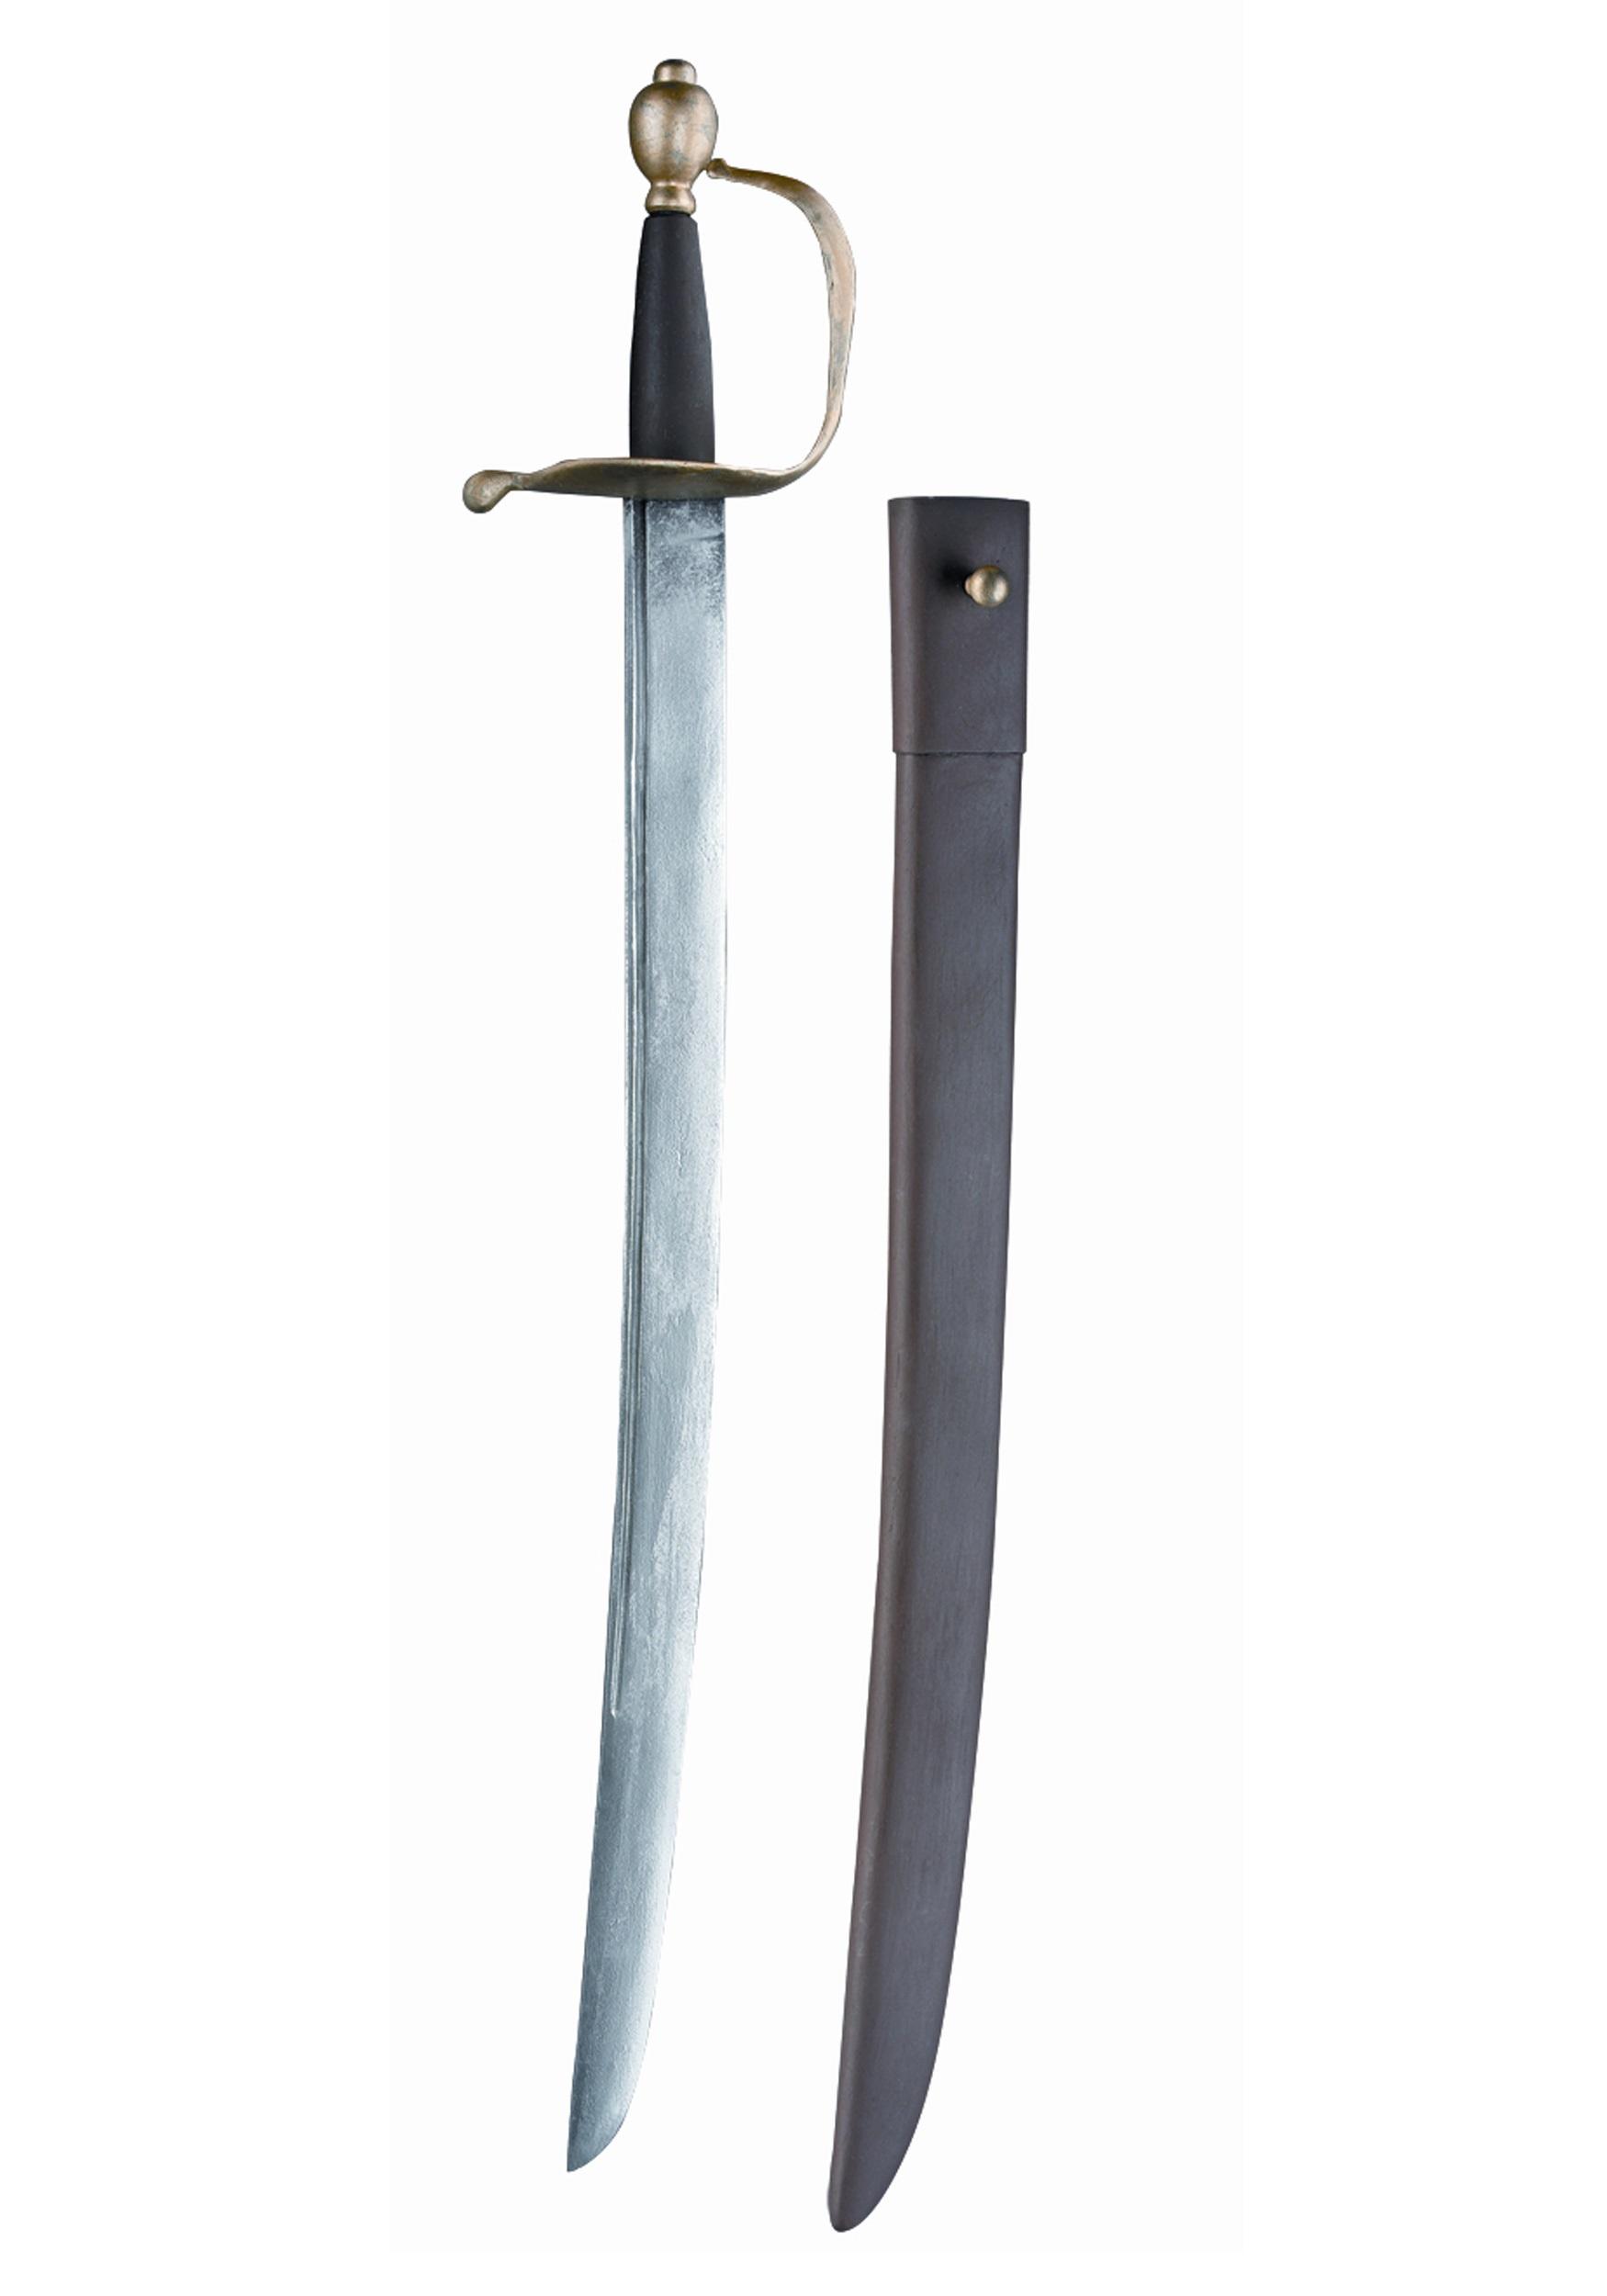 jack-sparrow-pirate-sword.jpg